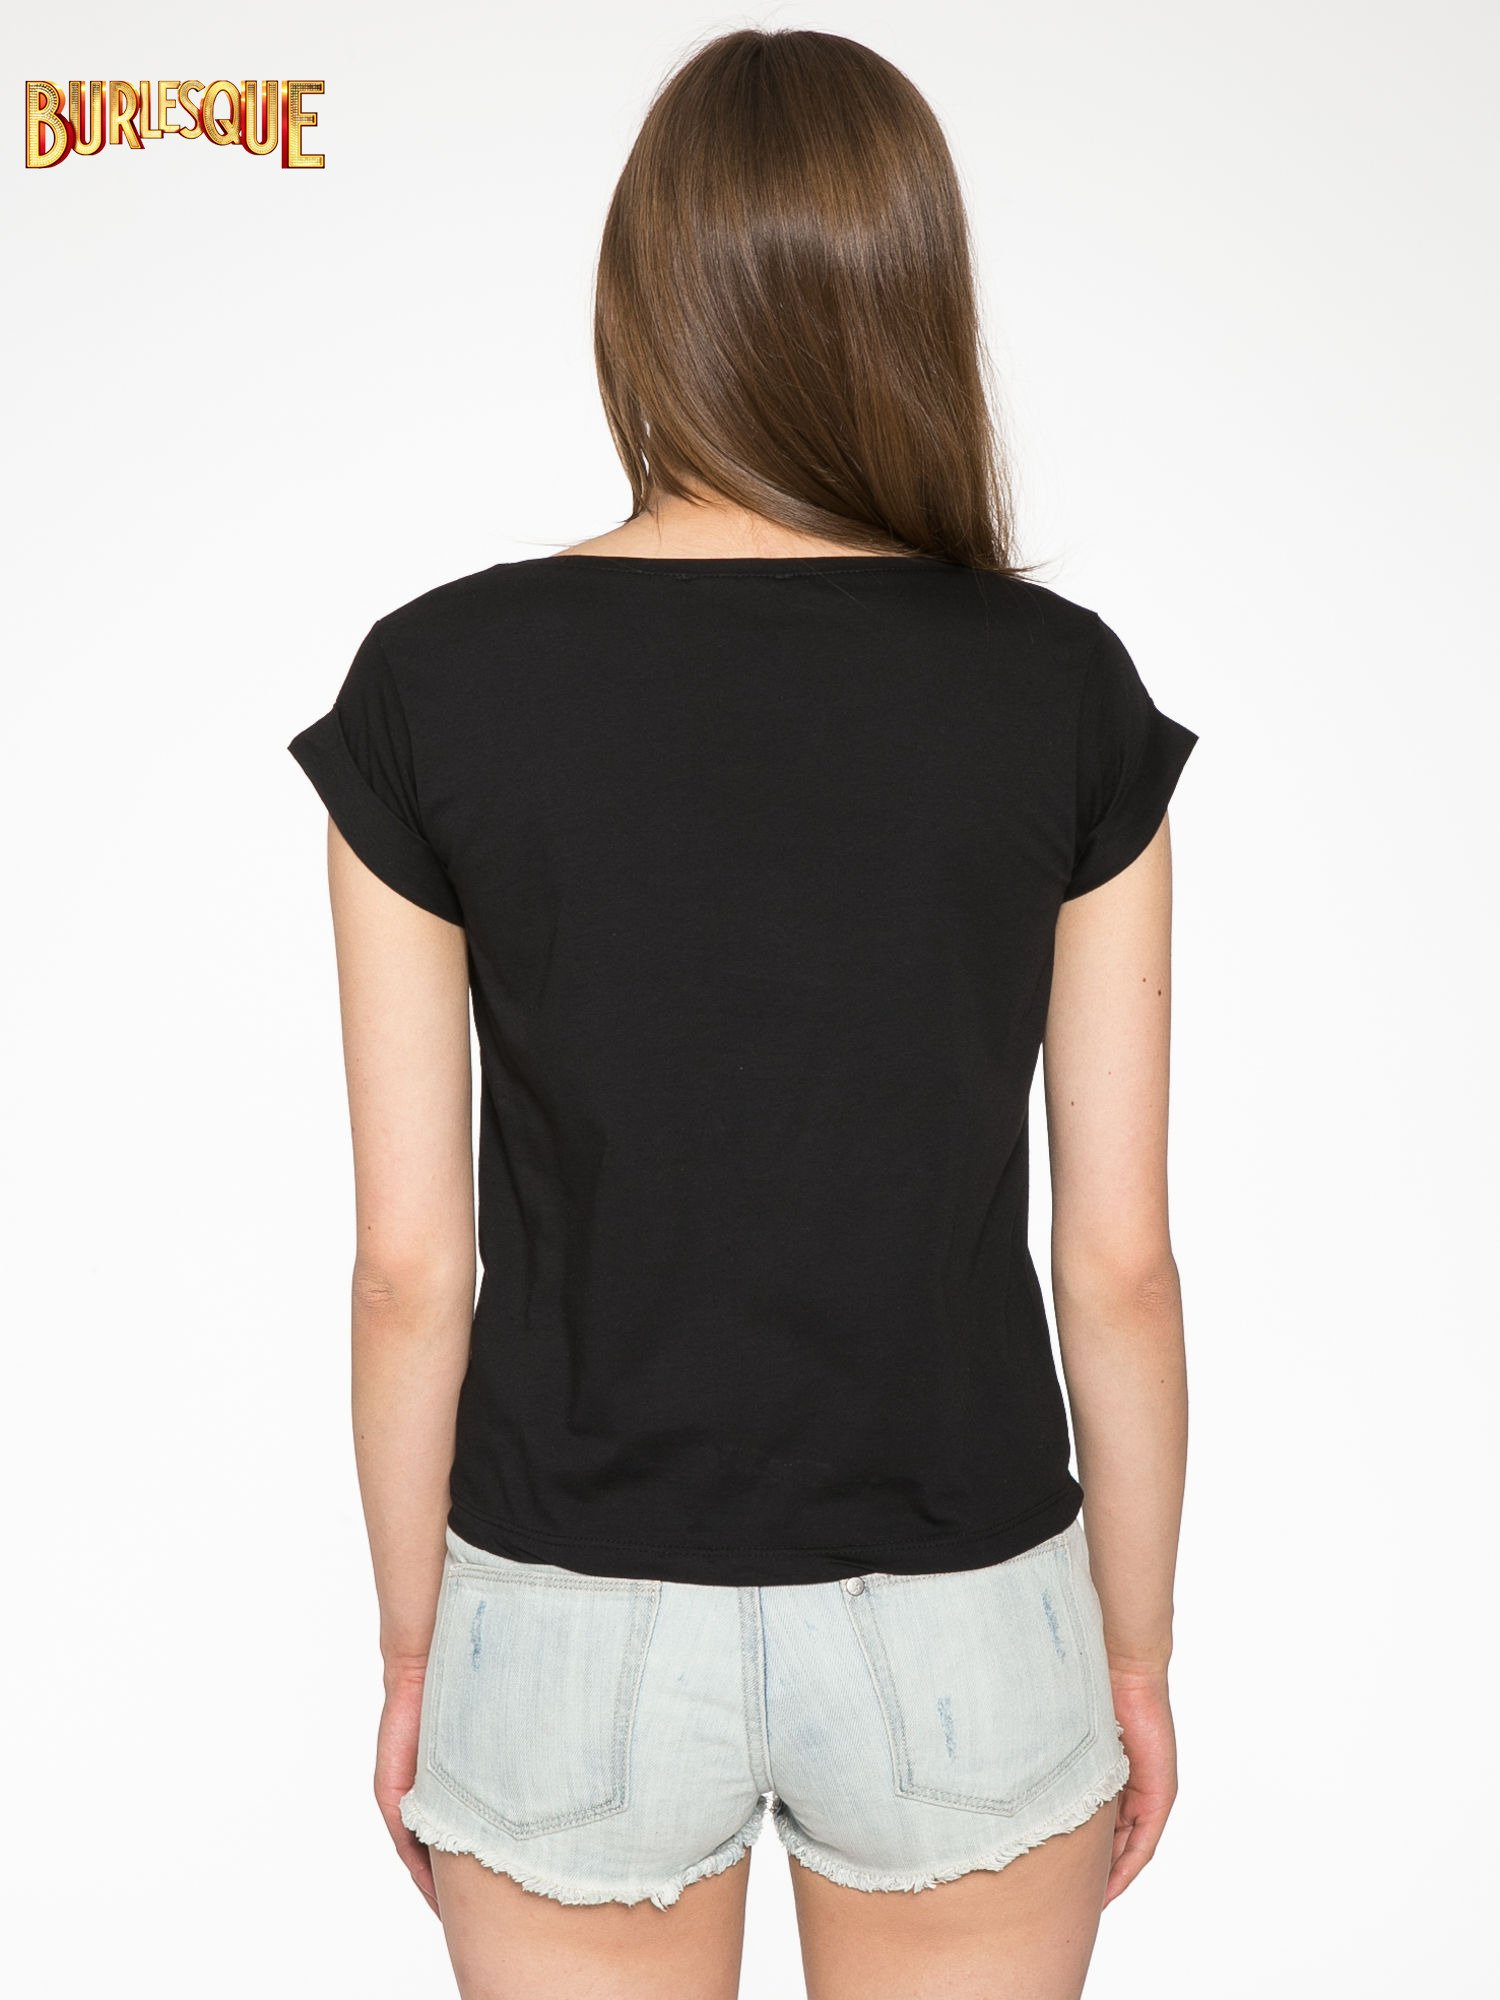 Czarny krótki t-shirt z nadrukiem stokrotek i napisem                                  zdj.                                  4